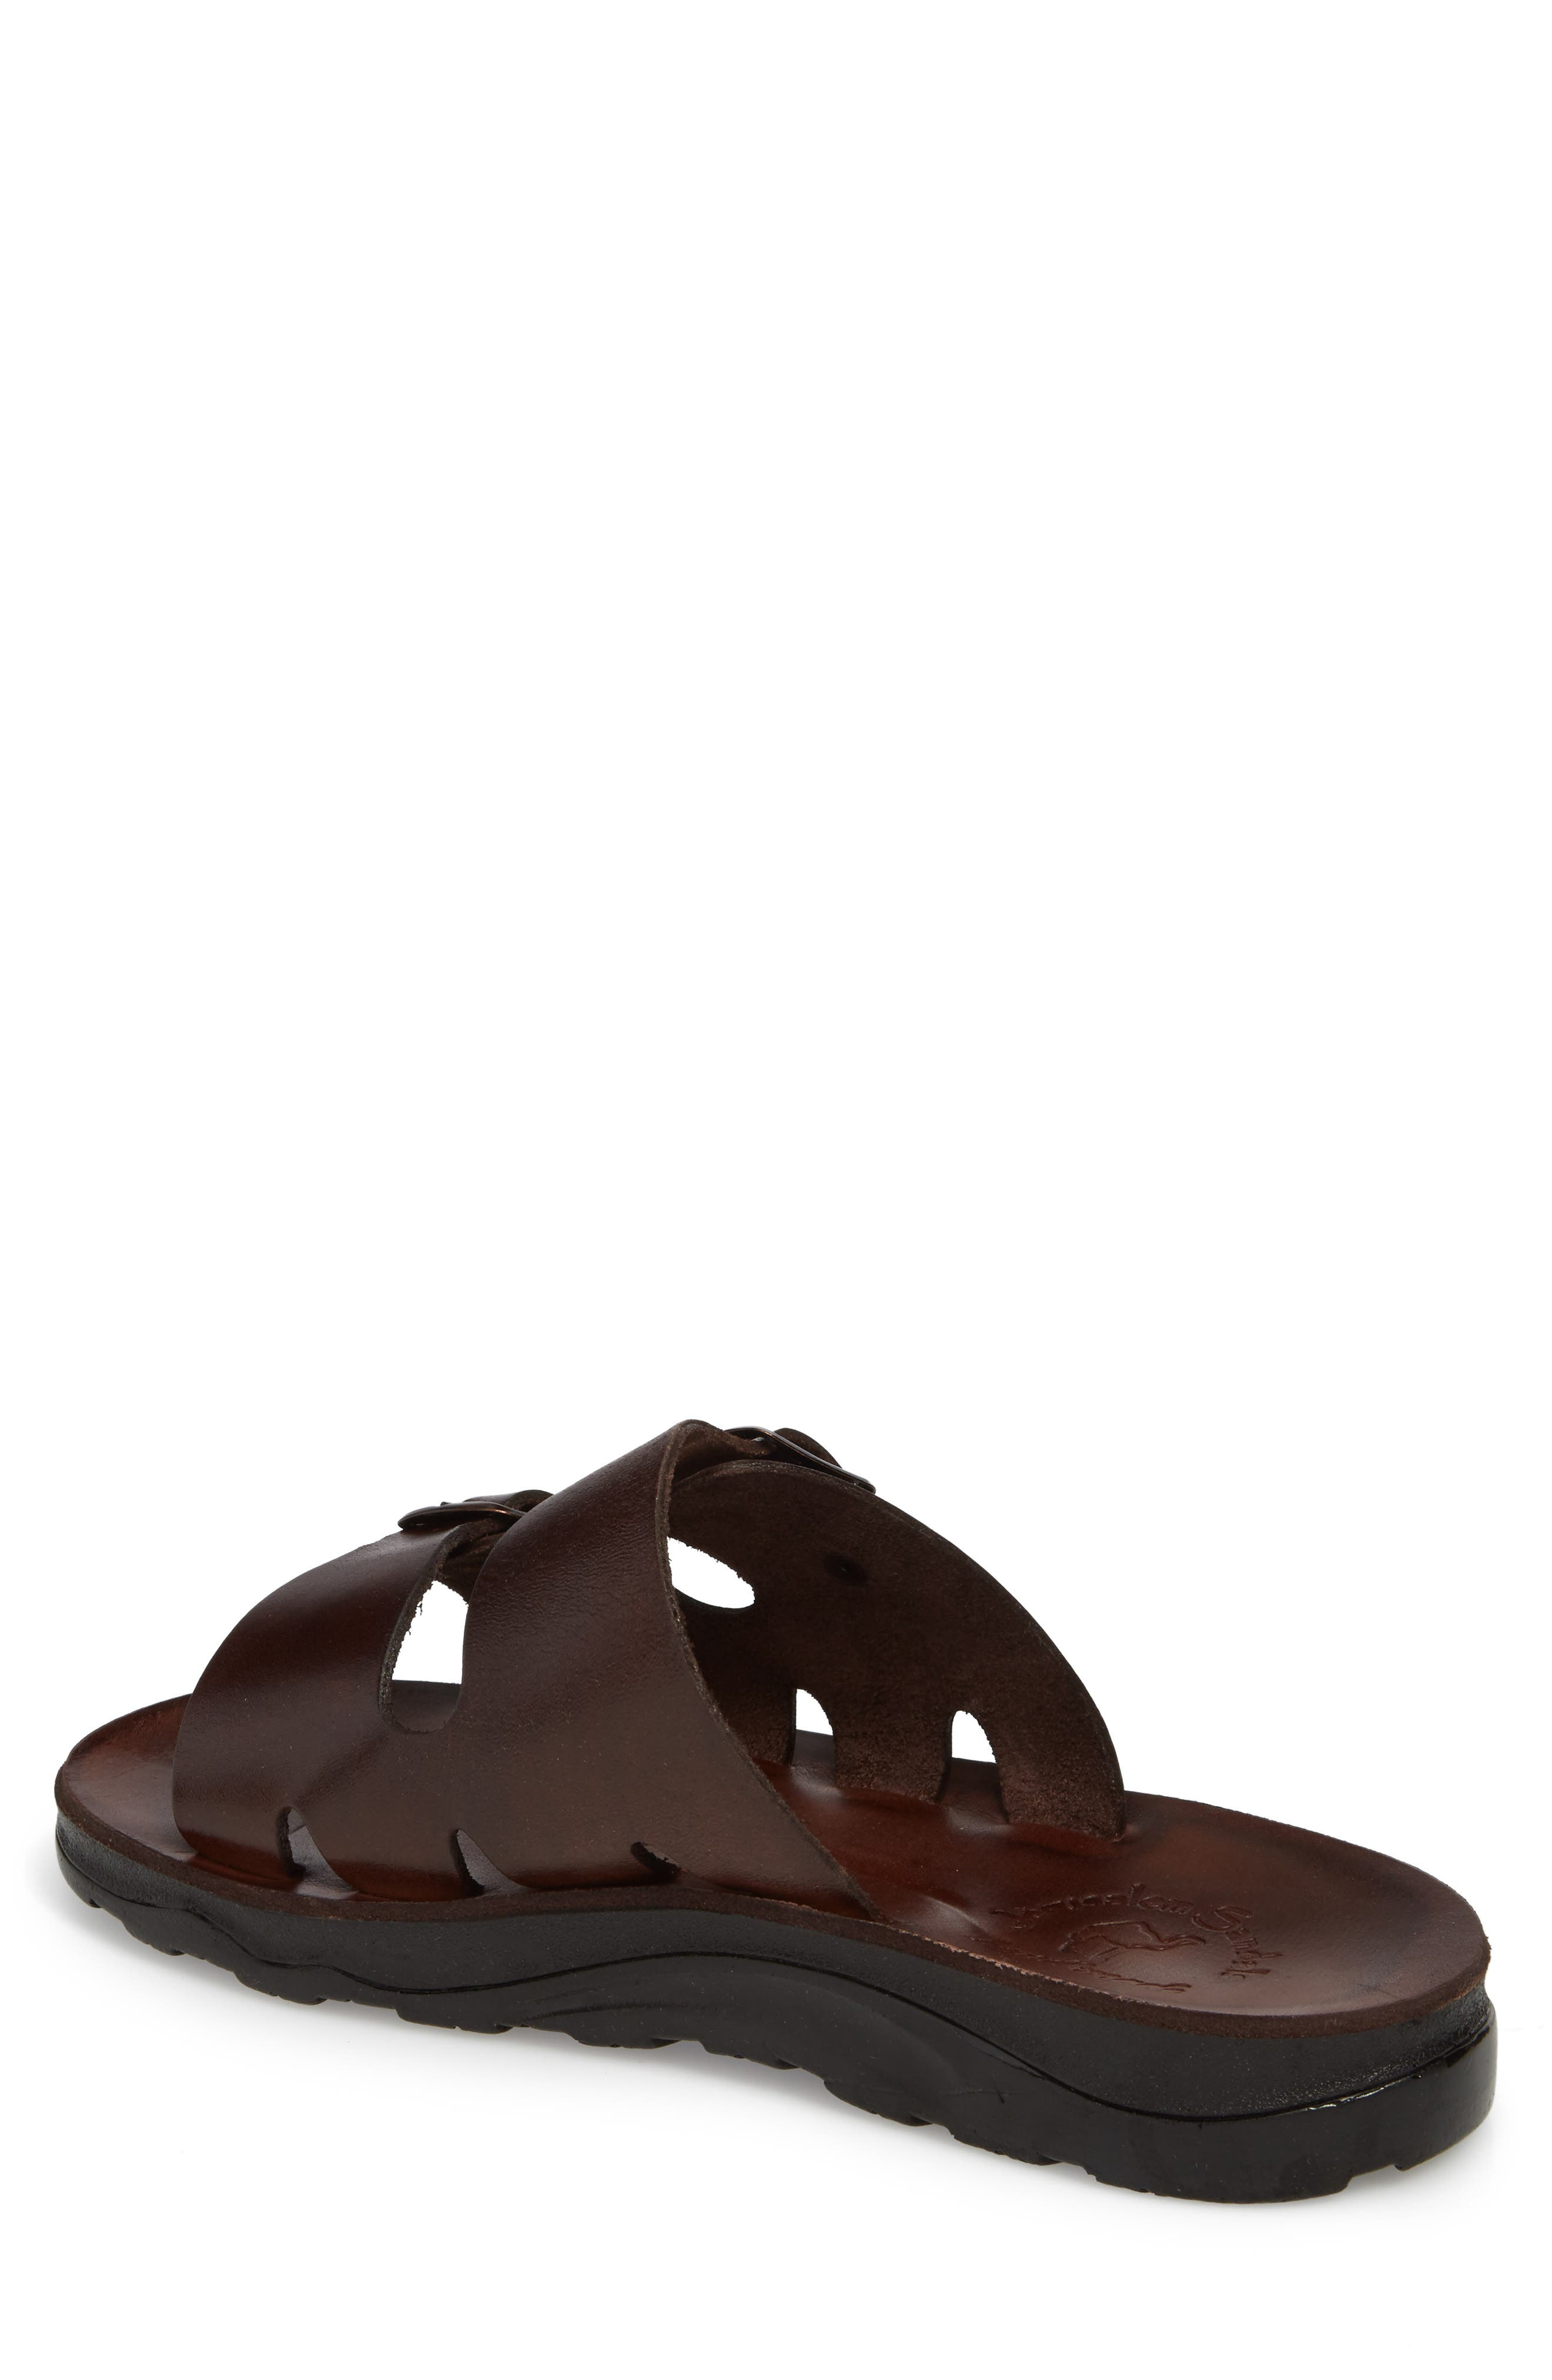 Barnabas Sandal,                             Alternate thumbnail 2, color,                             Brown Leather